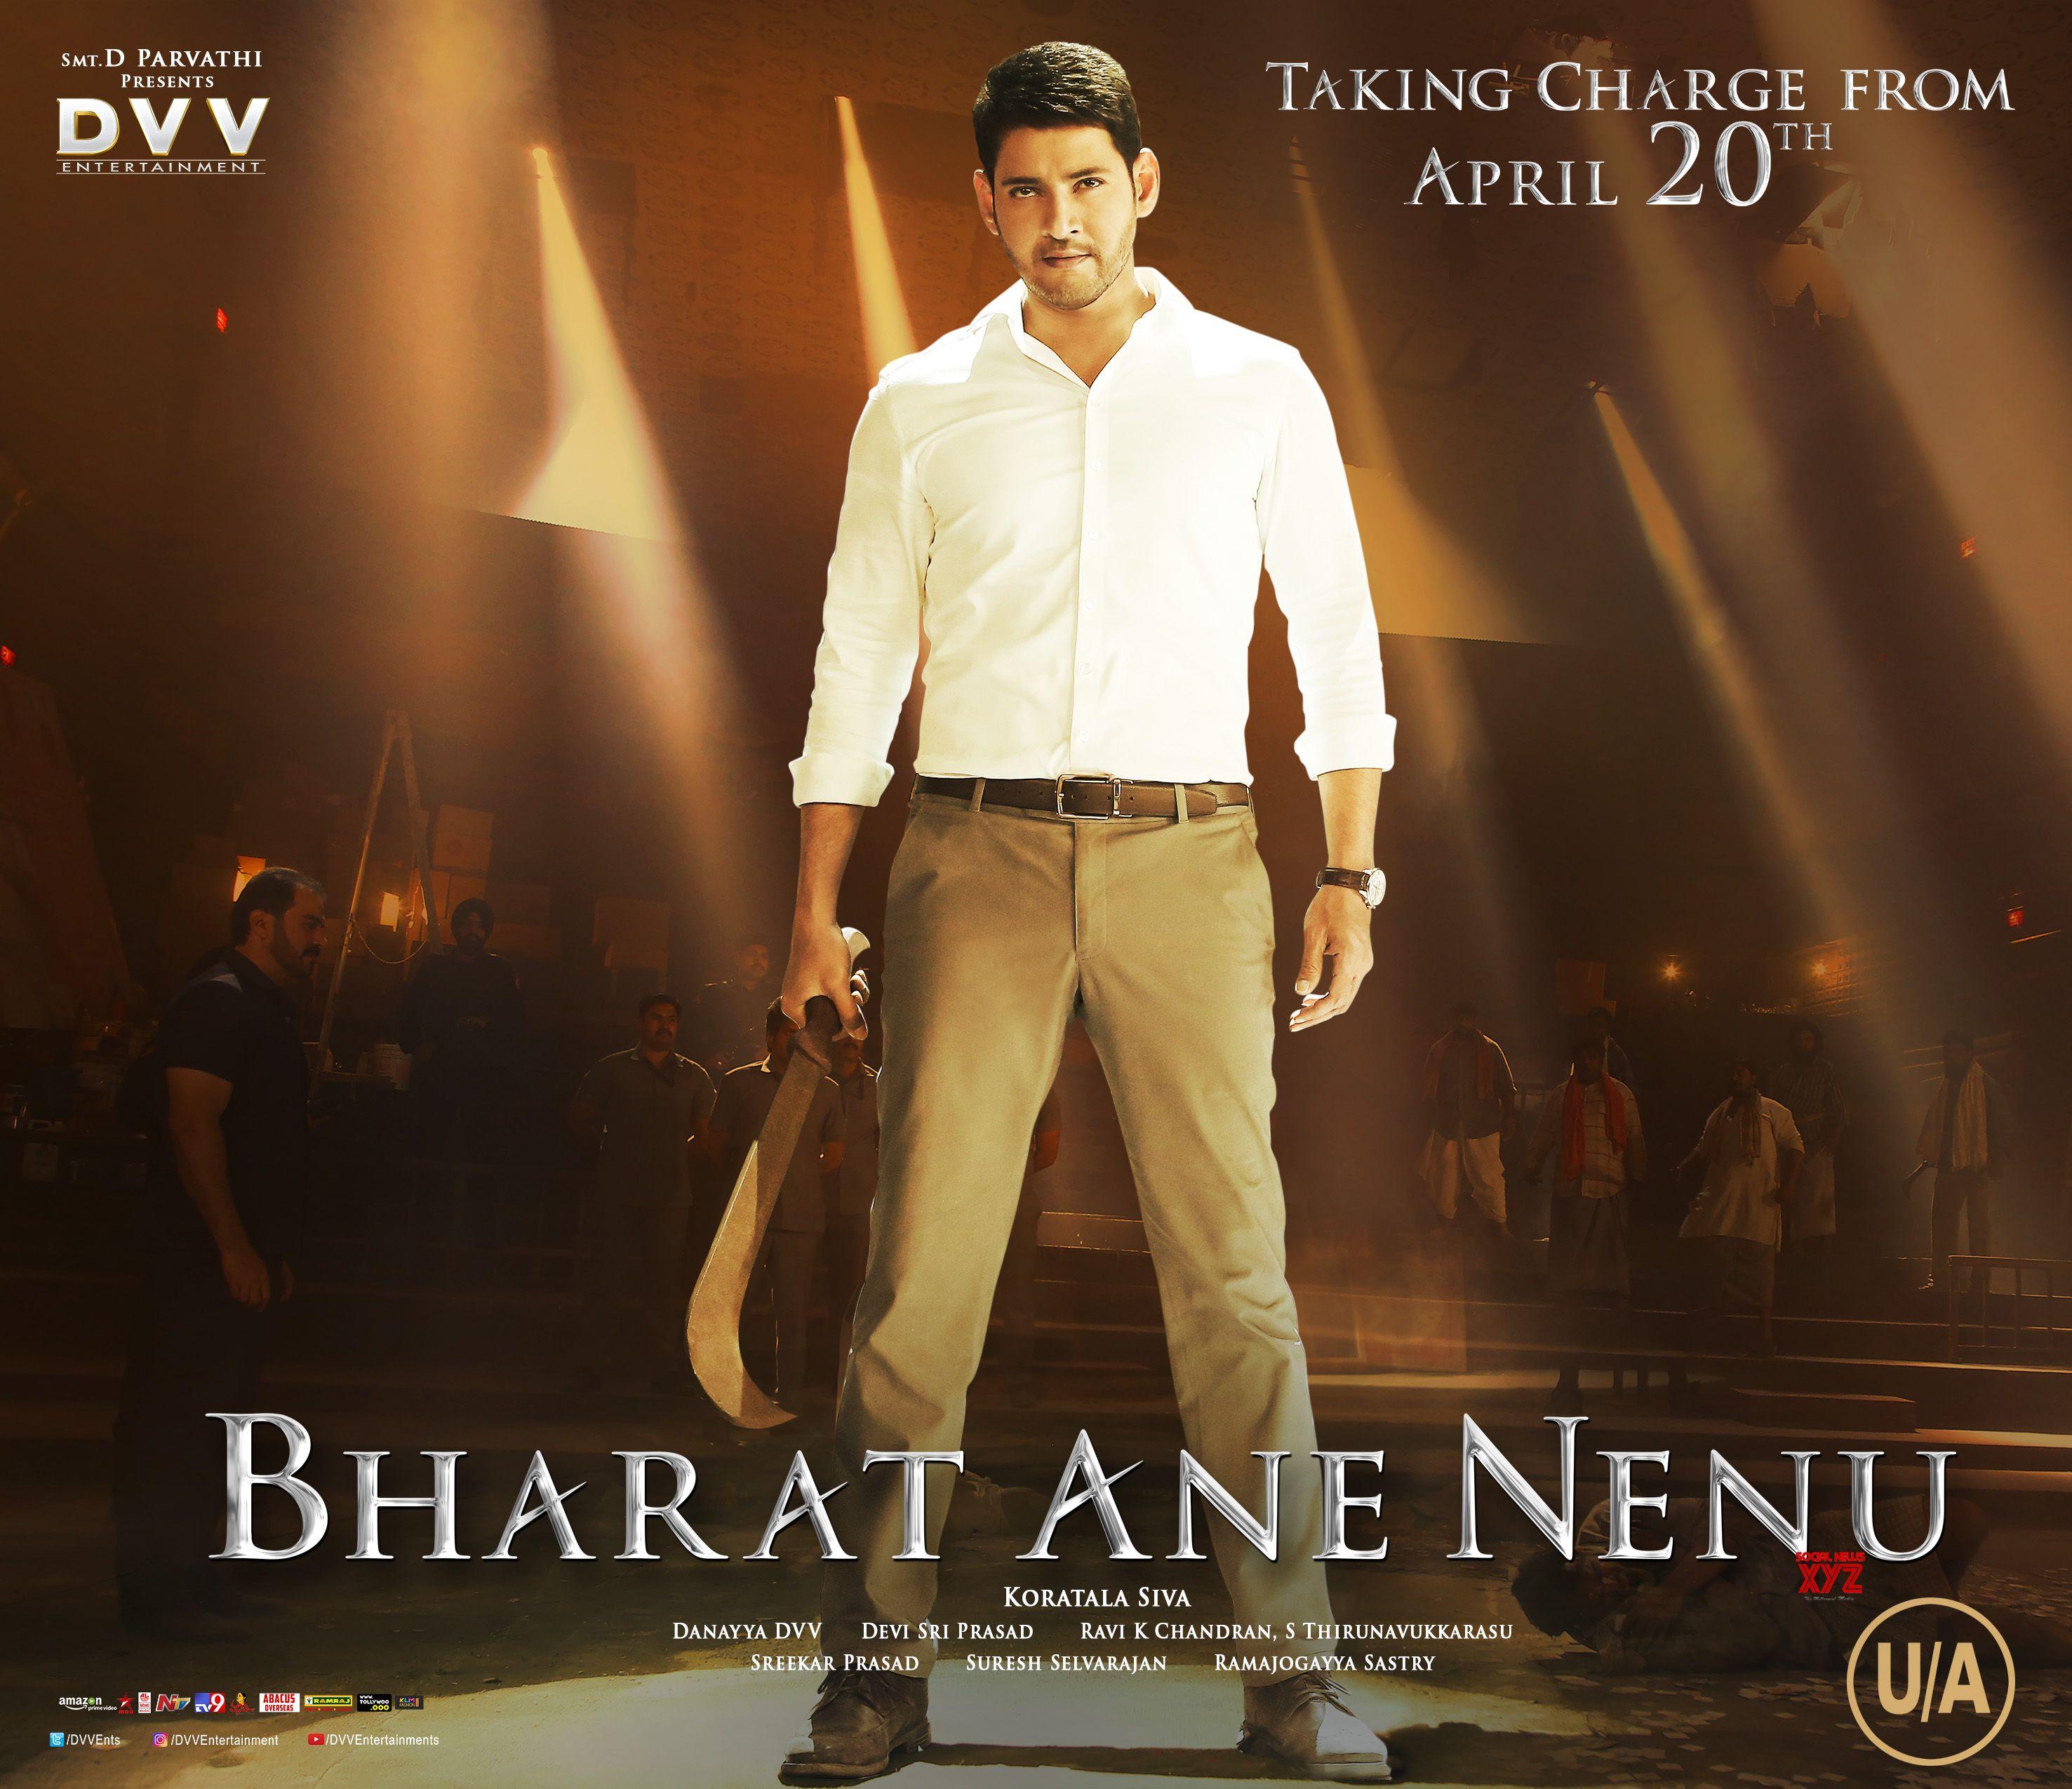 Bharat Ane Nenu Censored With UA Releasing Worldwide On April 20th